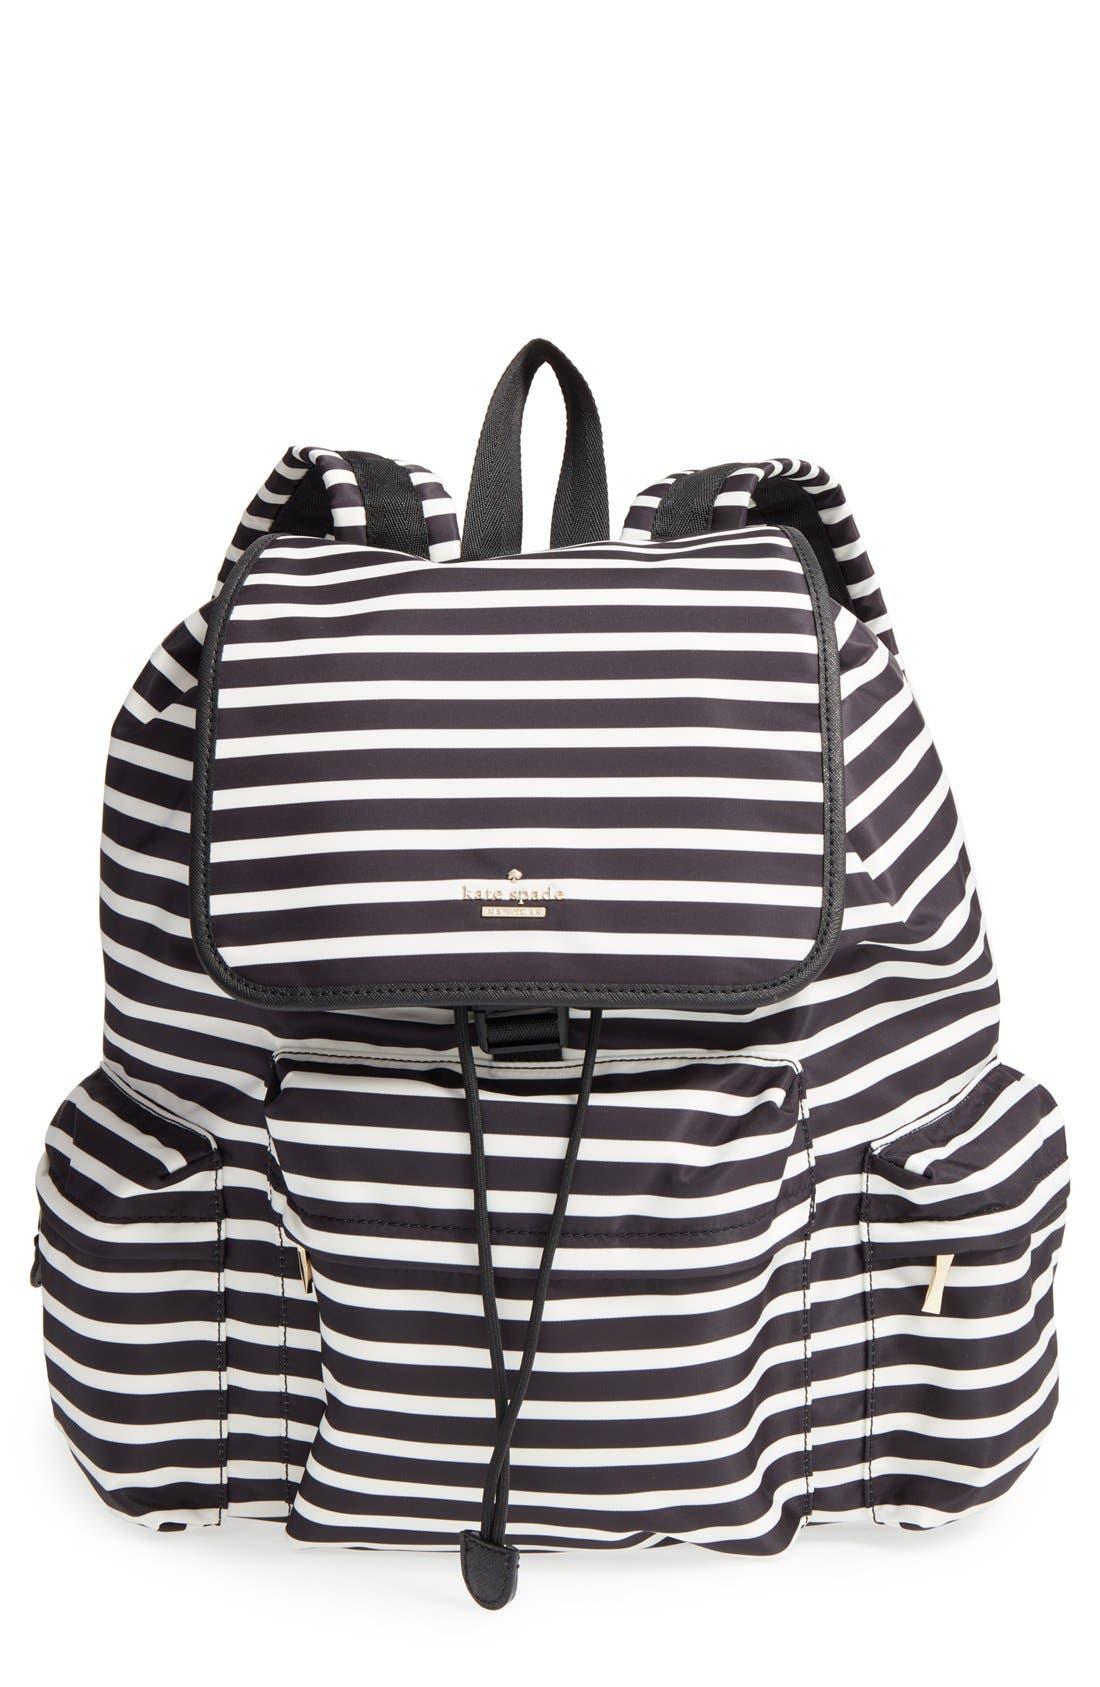 Main Image - kate spade new york 'classic - clay' nylon backpack